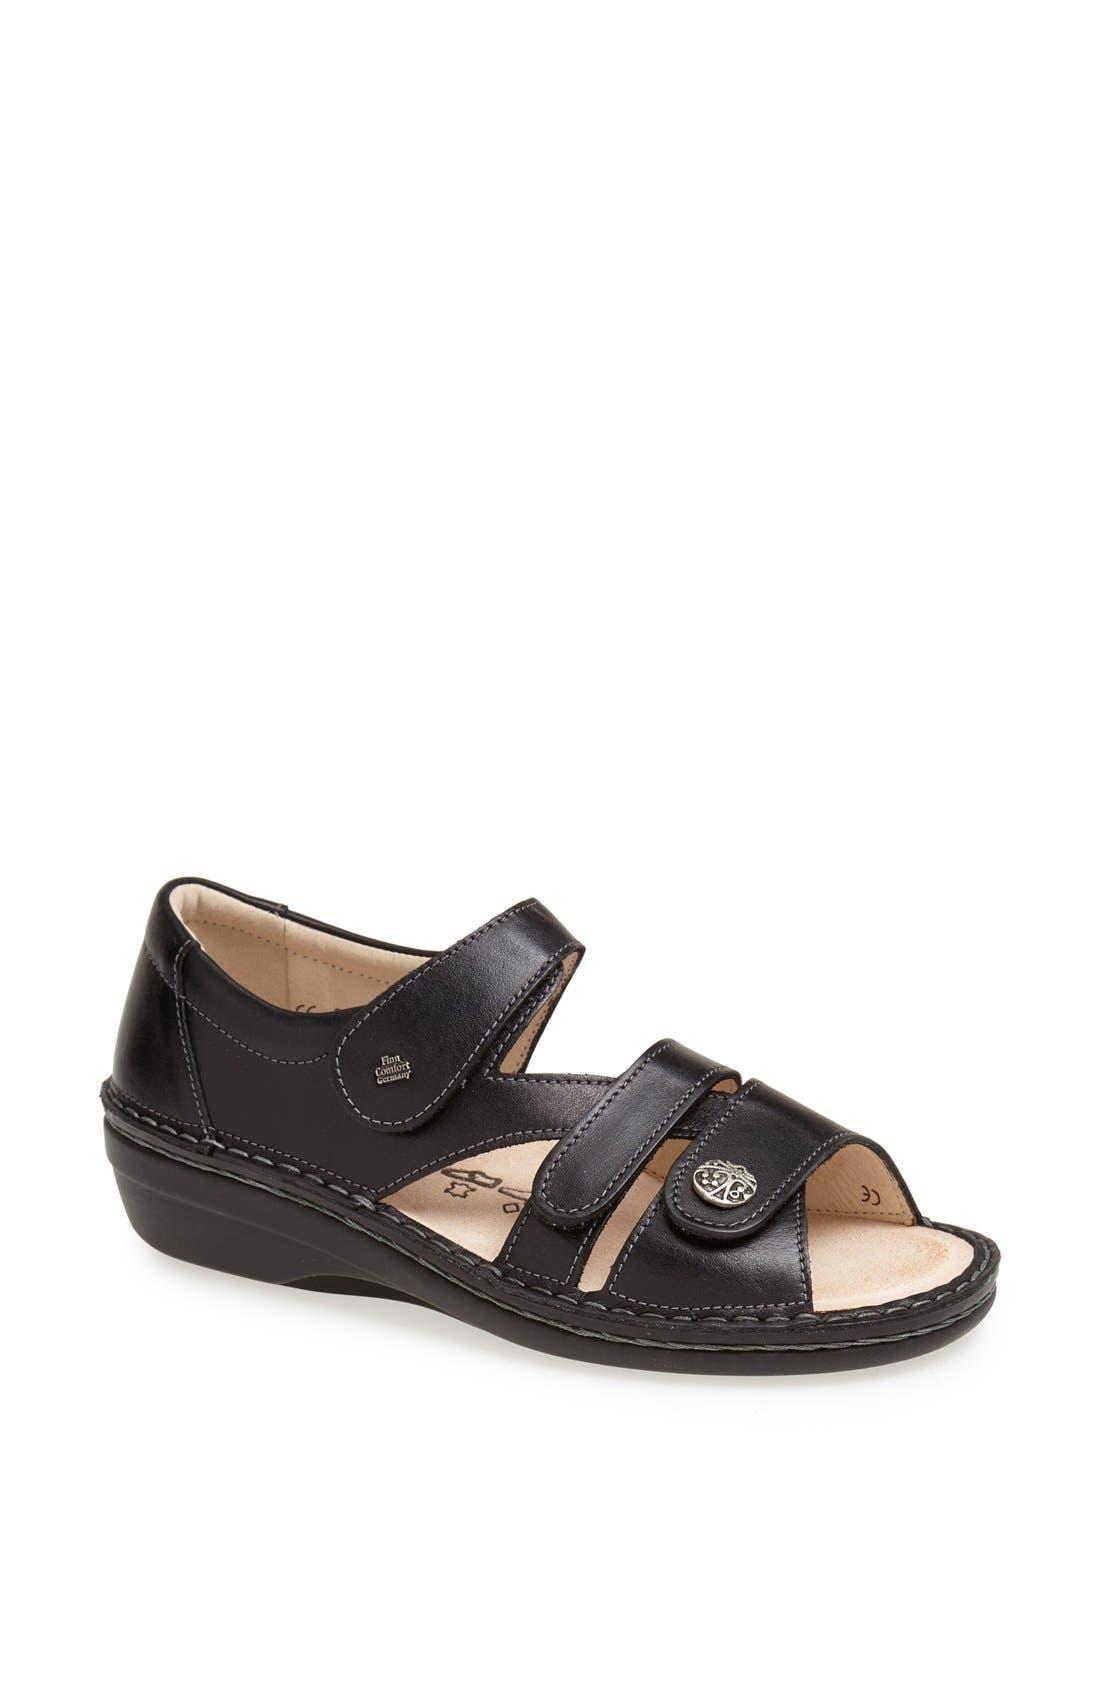 'Sintra' Sandal,                         Main,                         color, Black